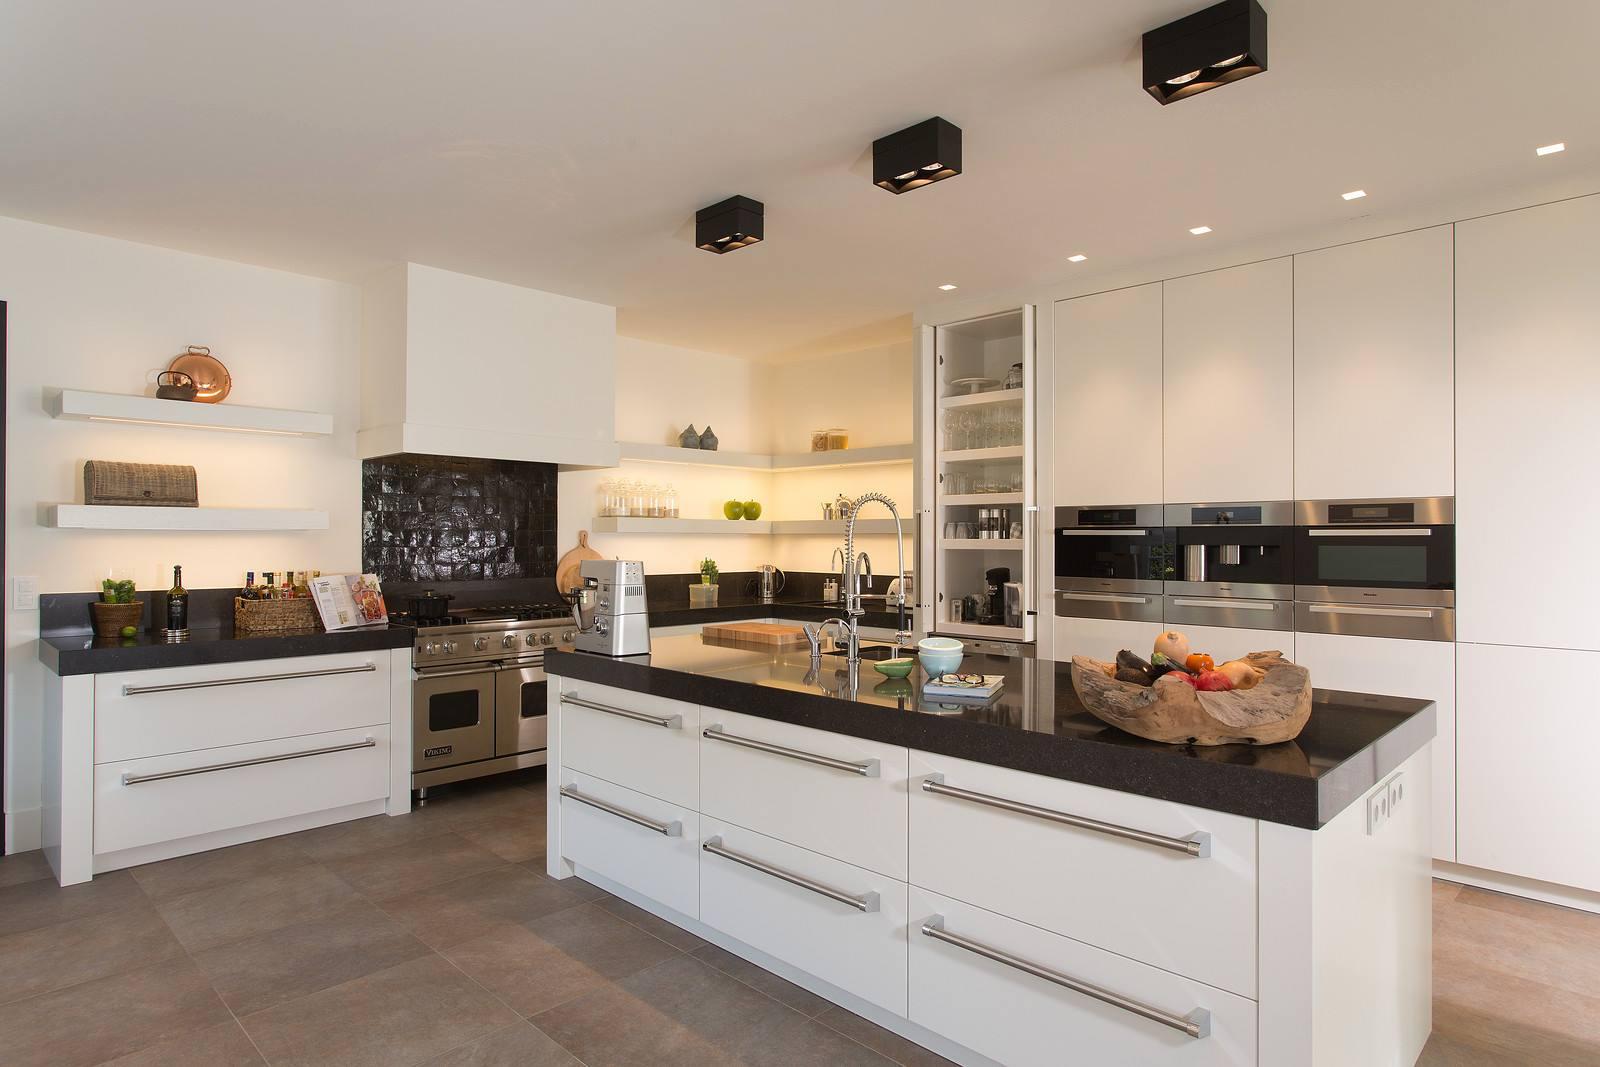 Woonkeuken met keukeneiland met brede lades en Miele inbouwapparatuur. Tieleman Keukens Exclusief Milano #tieleman #miele #keukentrends #keuken